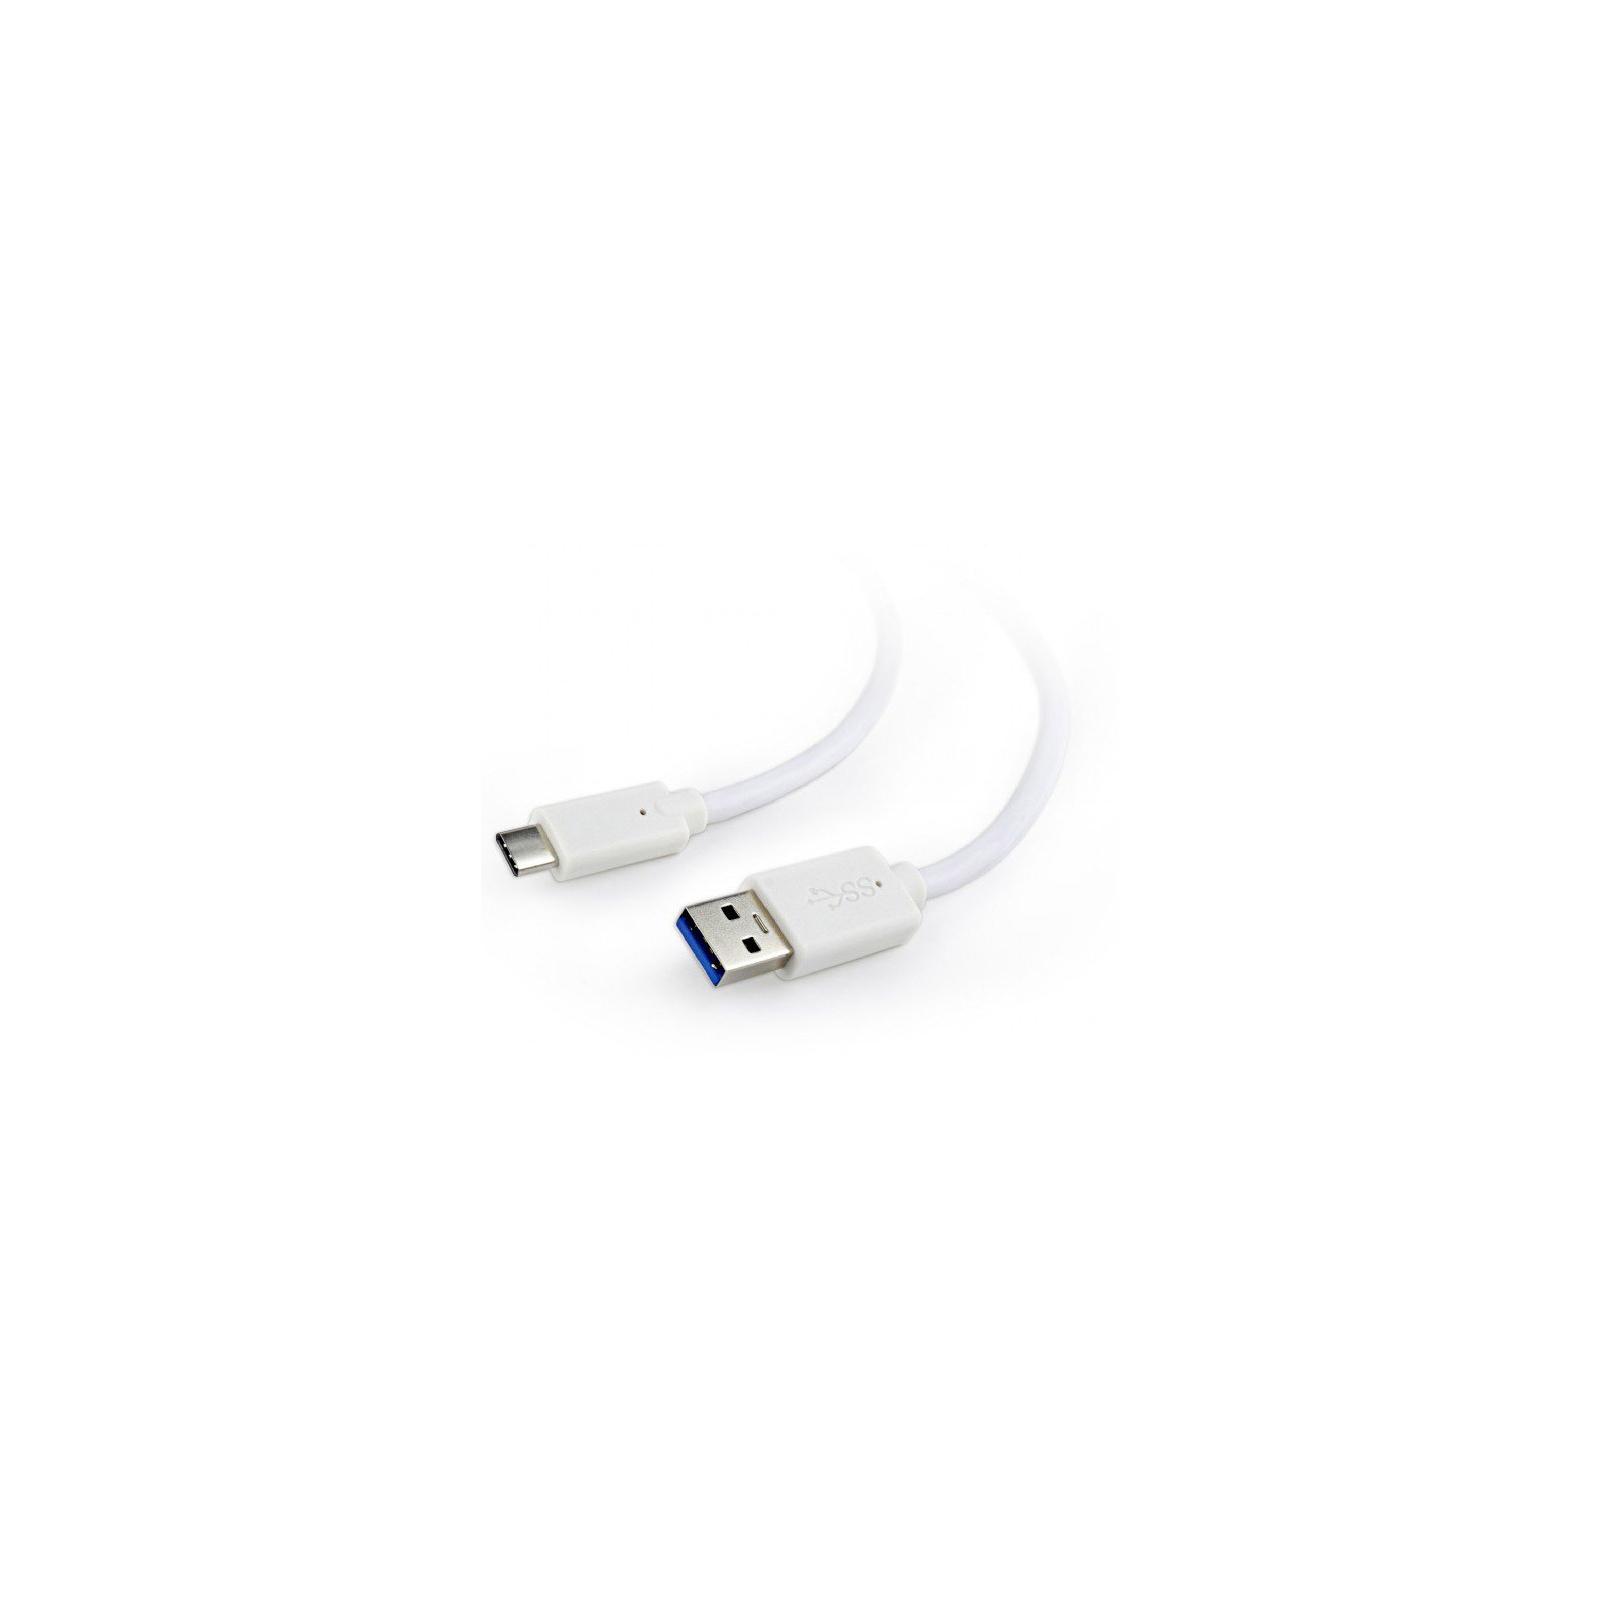 Дата кабель USB 3.0 AM to Type-C 0.1m Cablexpert (CCP-USB3-AMCM-W-0.1M)